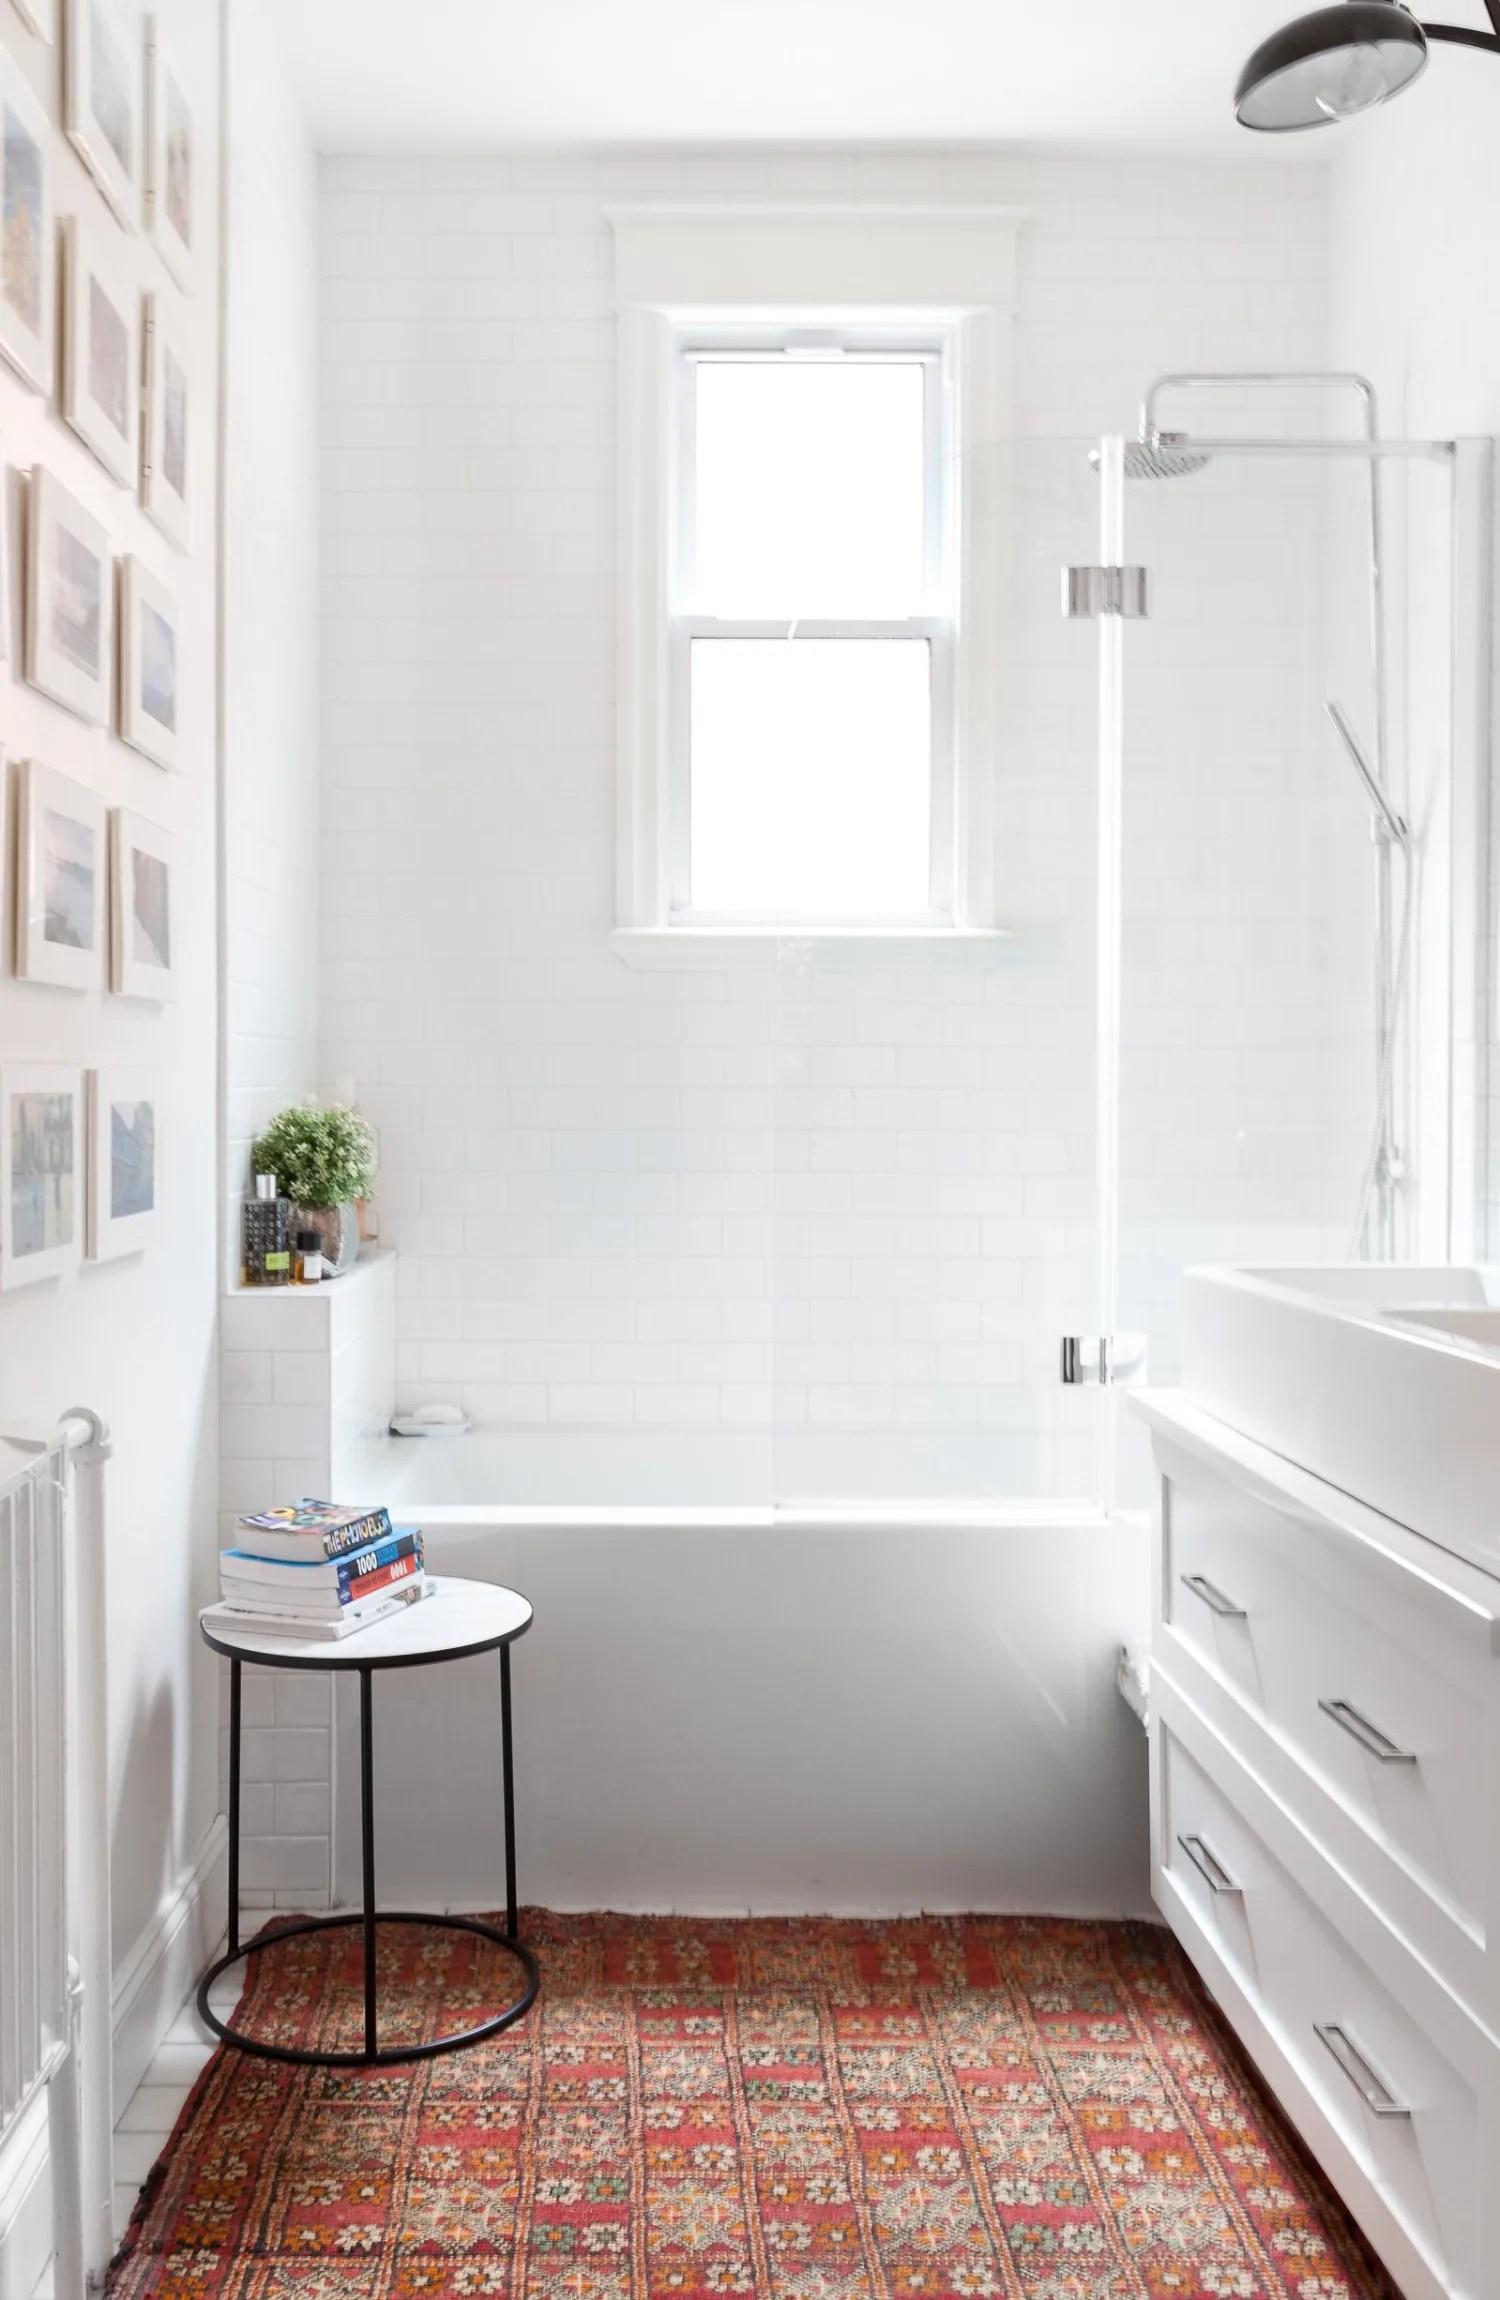 Small Bathroom Design Ideas - 7 Beautiful Remodels ... on Apartment Bathroom Ideas  id=85040